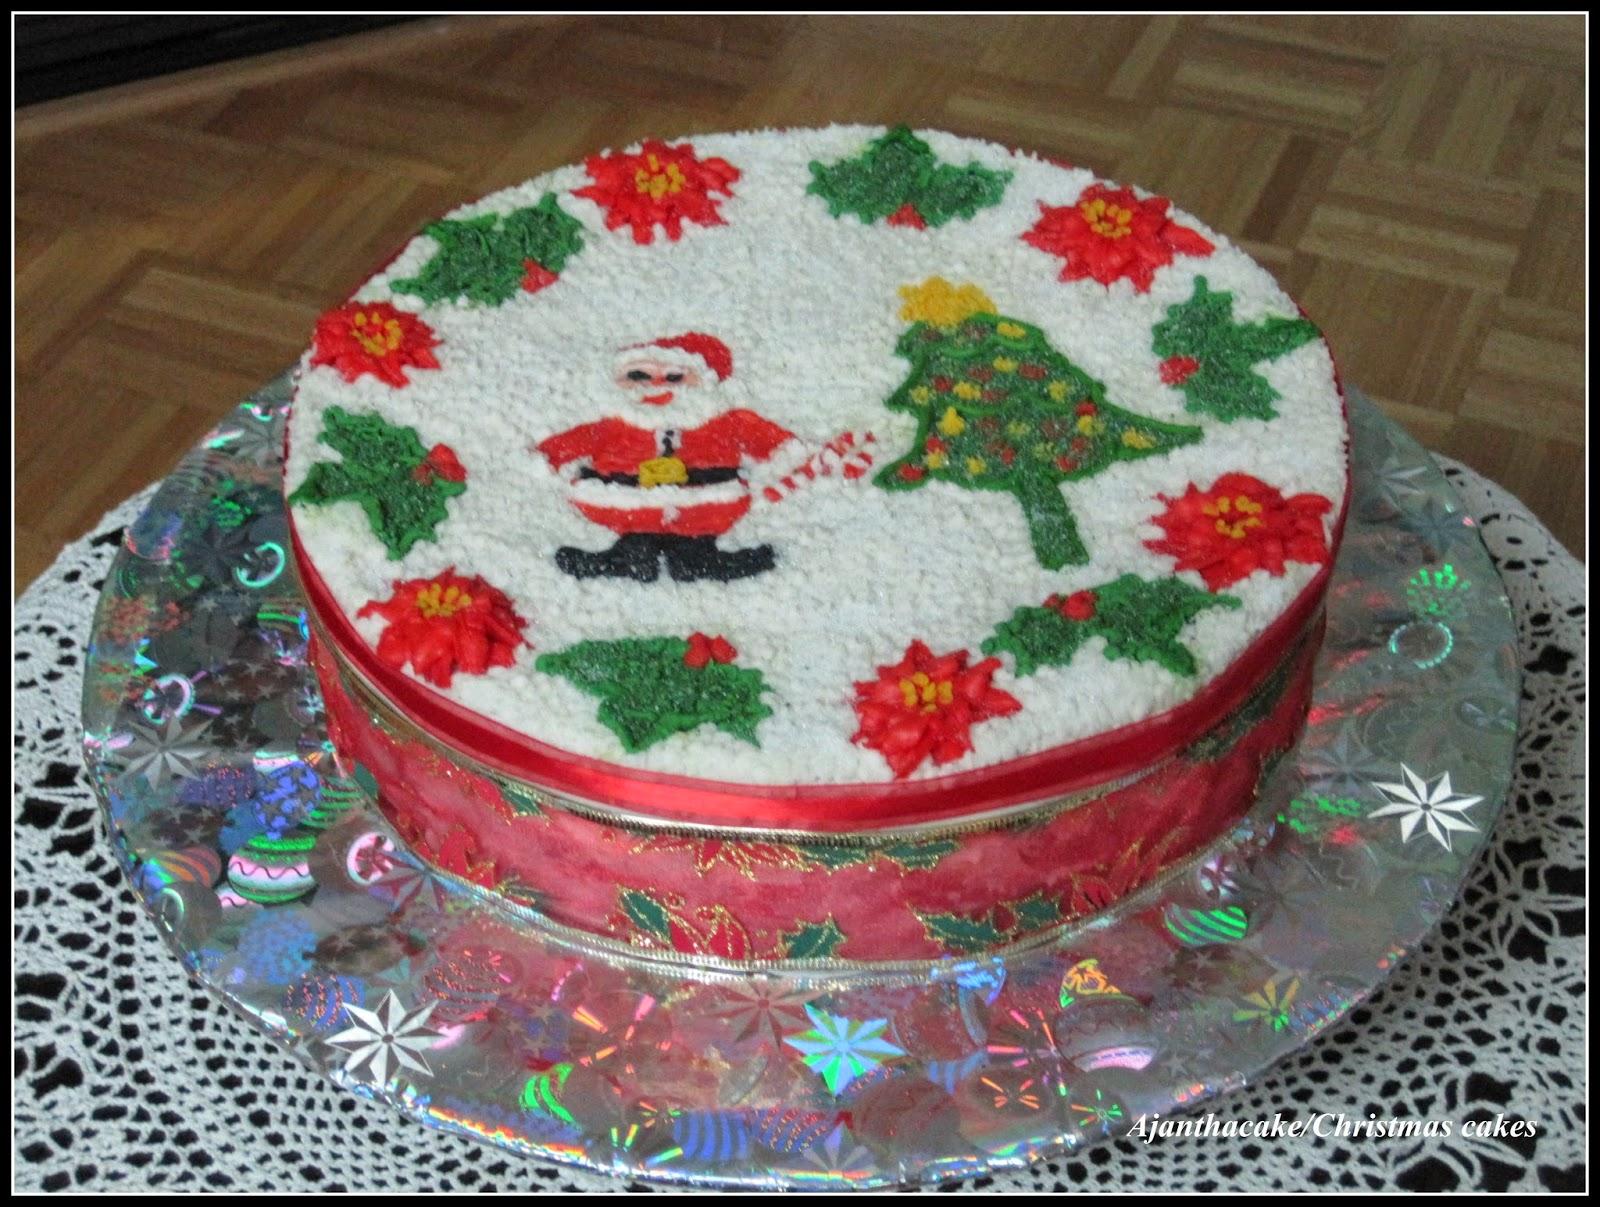 Ajantha Cakes/Christmas Cakes